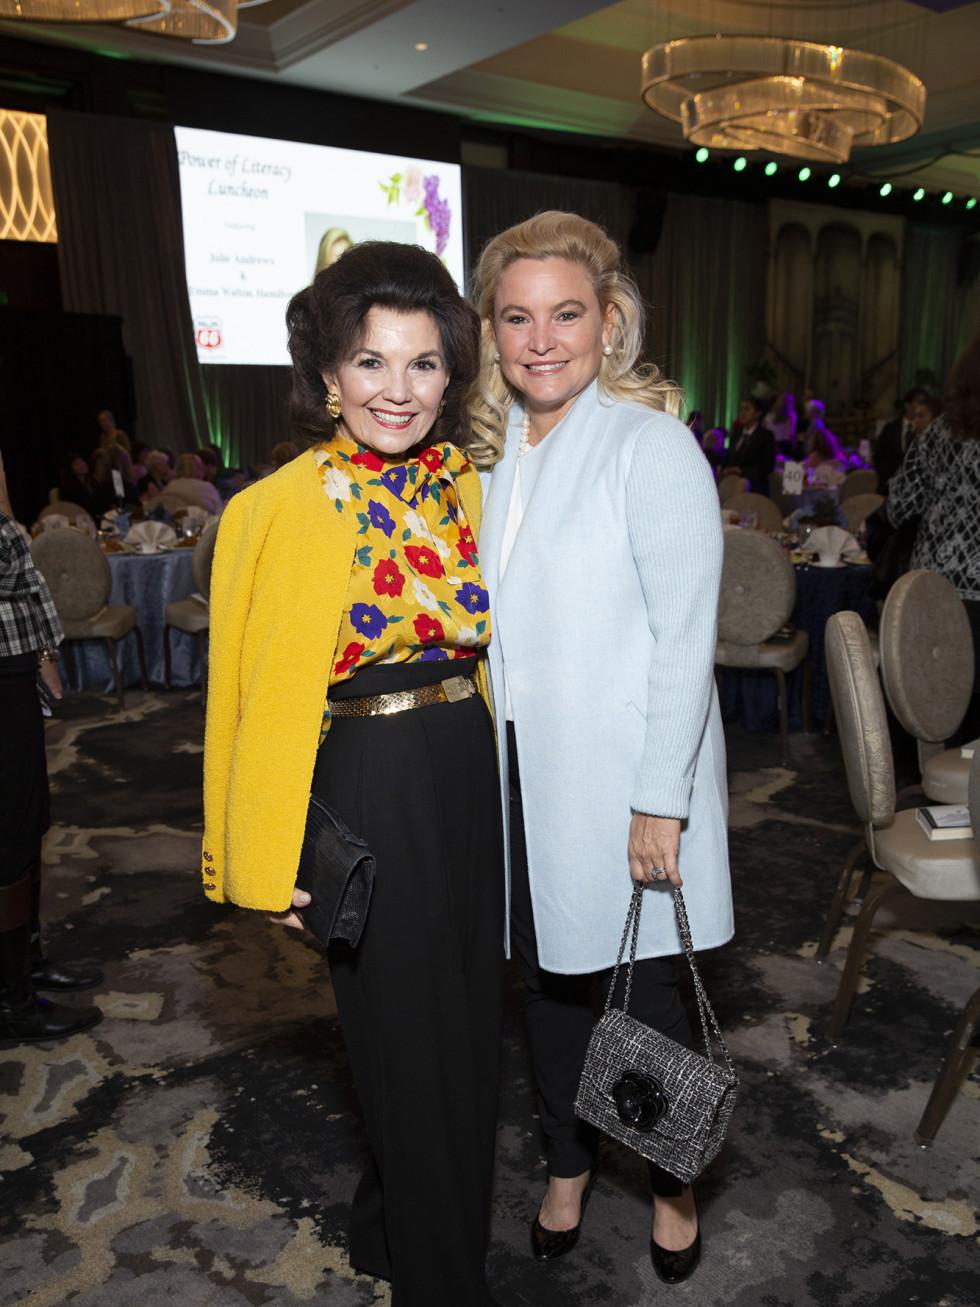 Barbara Bush Power of Literacy Luncheon Julie Andrews 2019  Linda McReynolds  and Merritt Marinelli